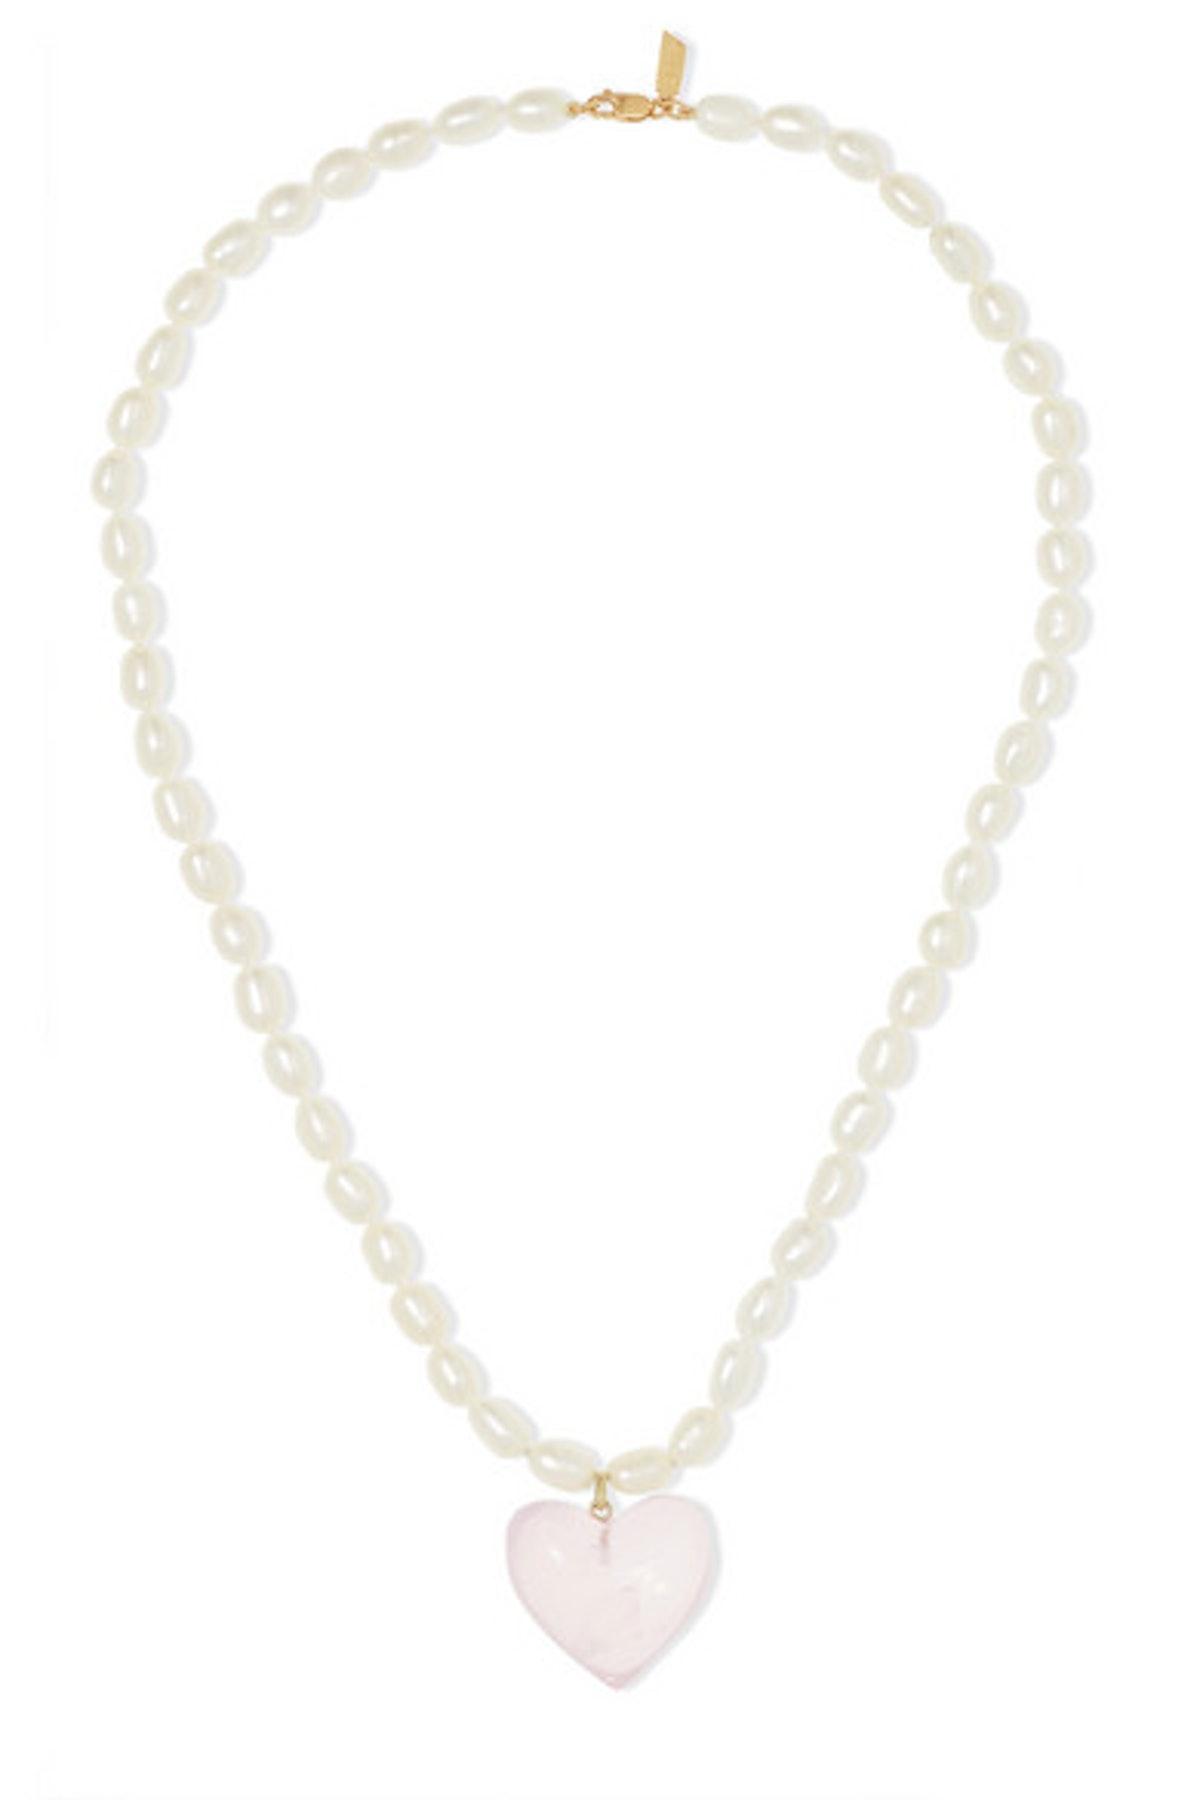 Pearl and Quartz Necklace